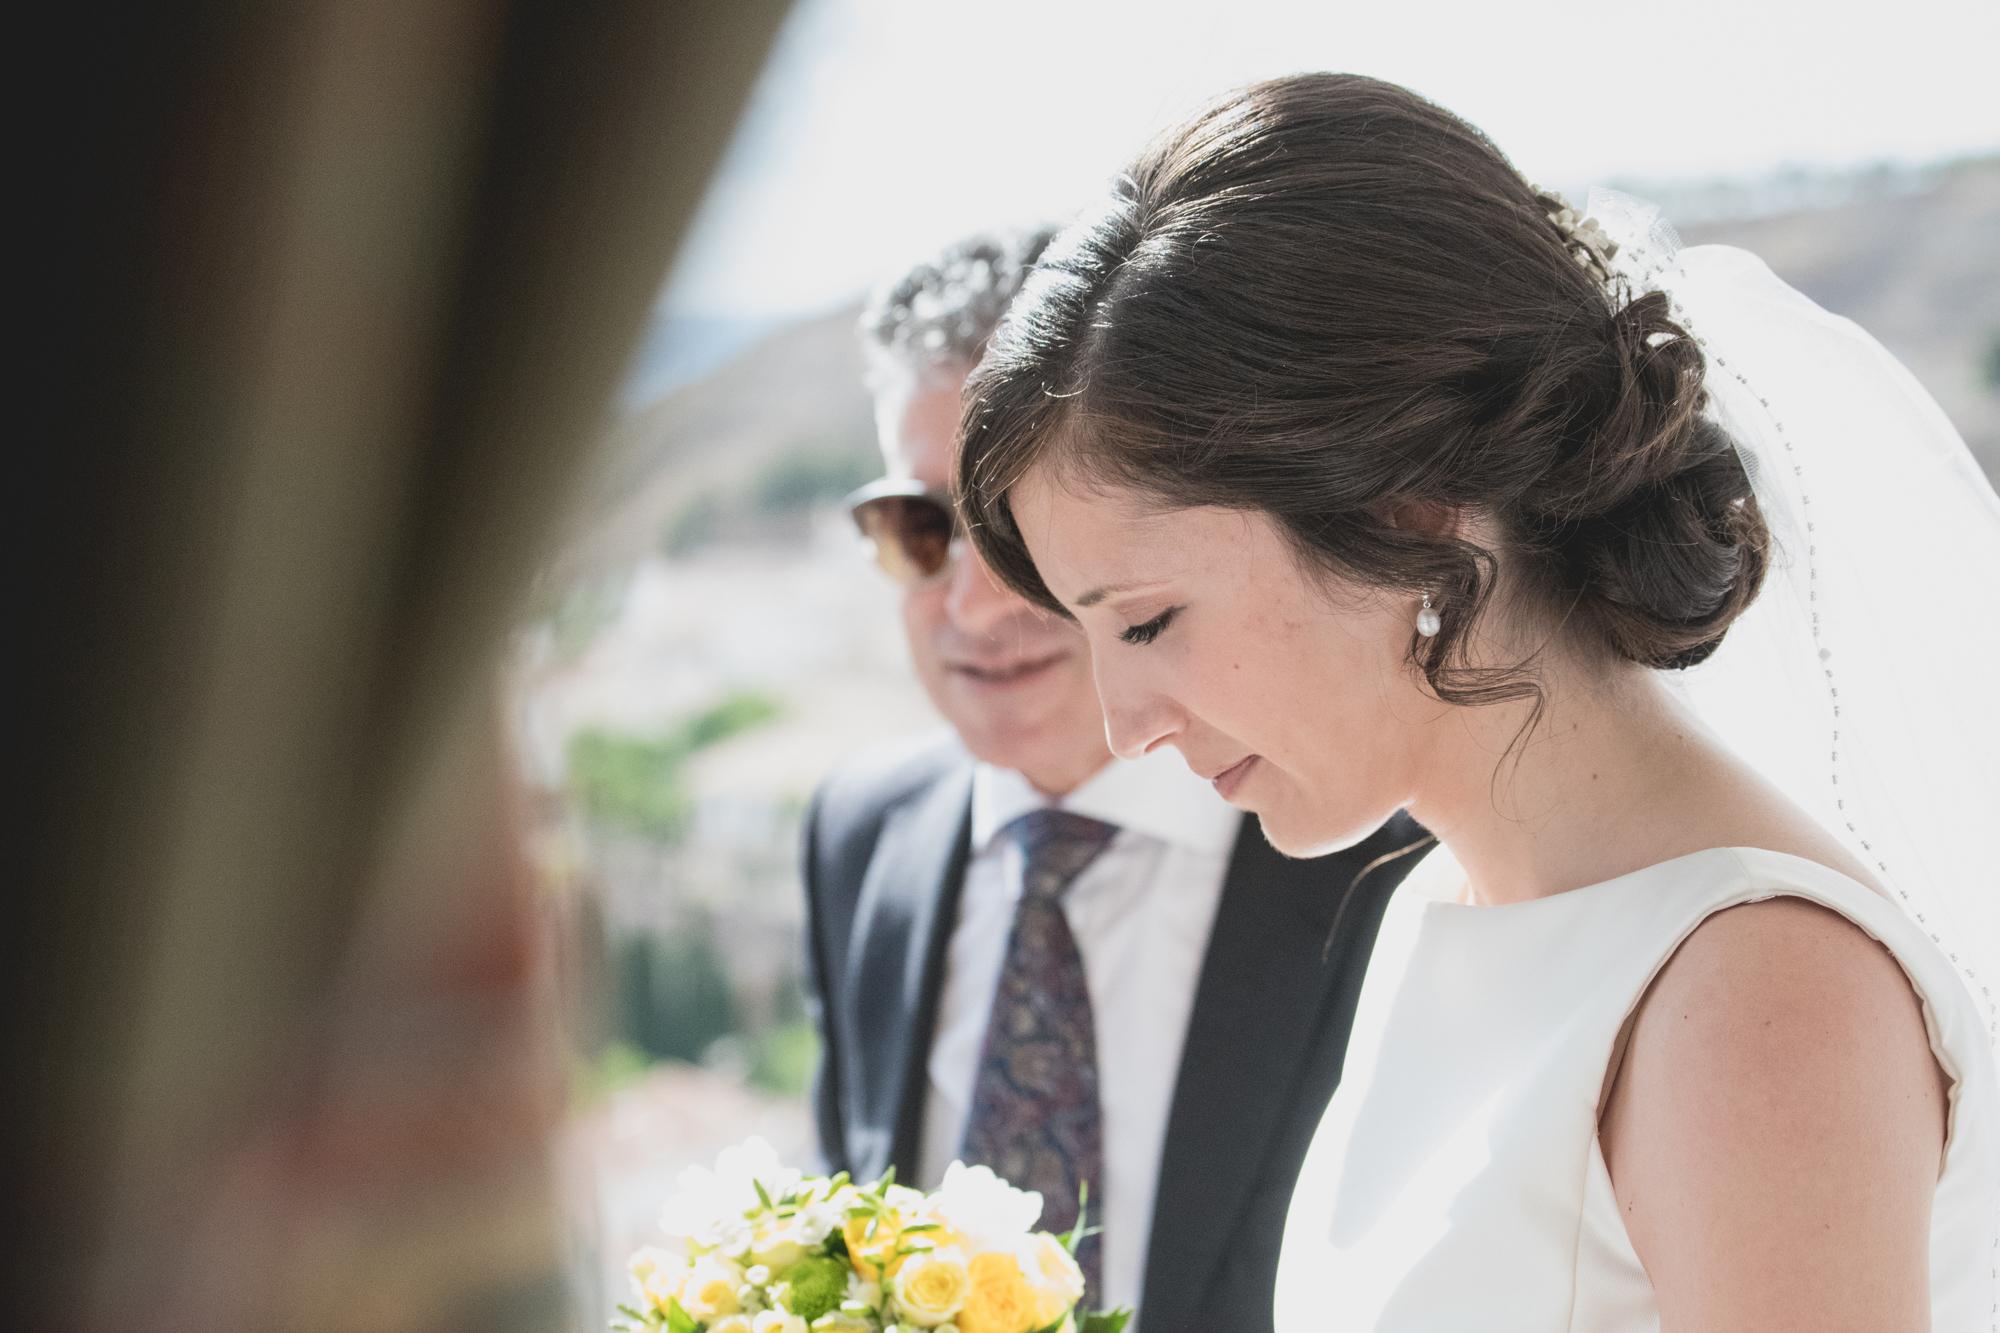 fotografia-de-boda-preparativos-novia.jpg